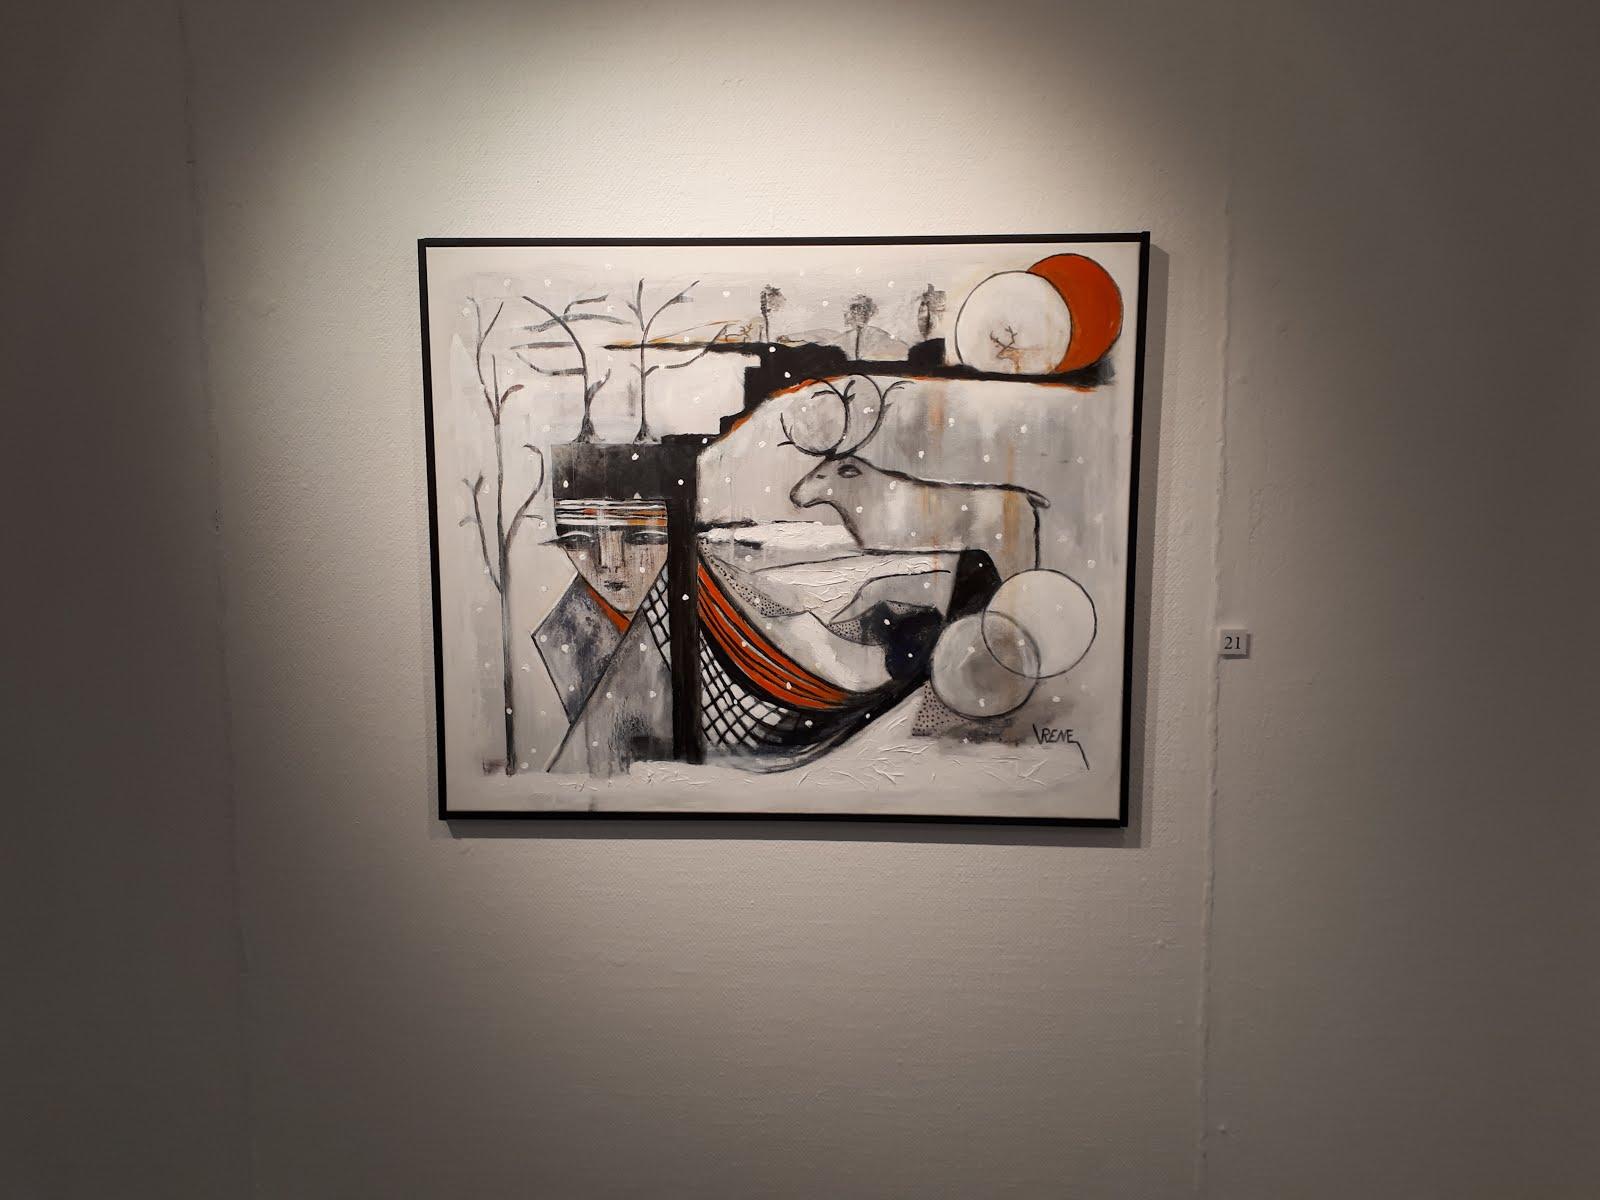 Gästrik konst 2019